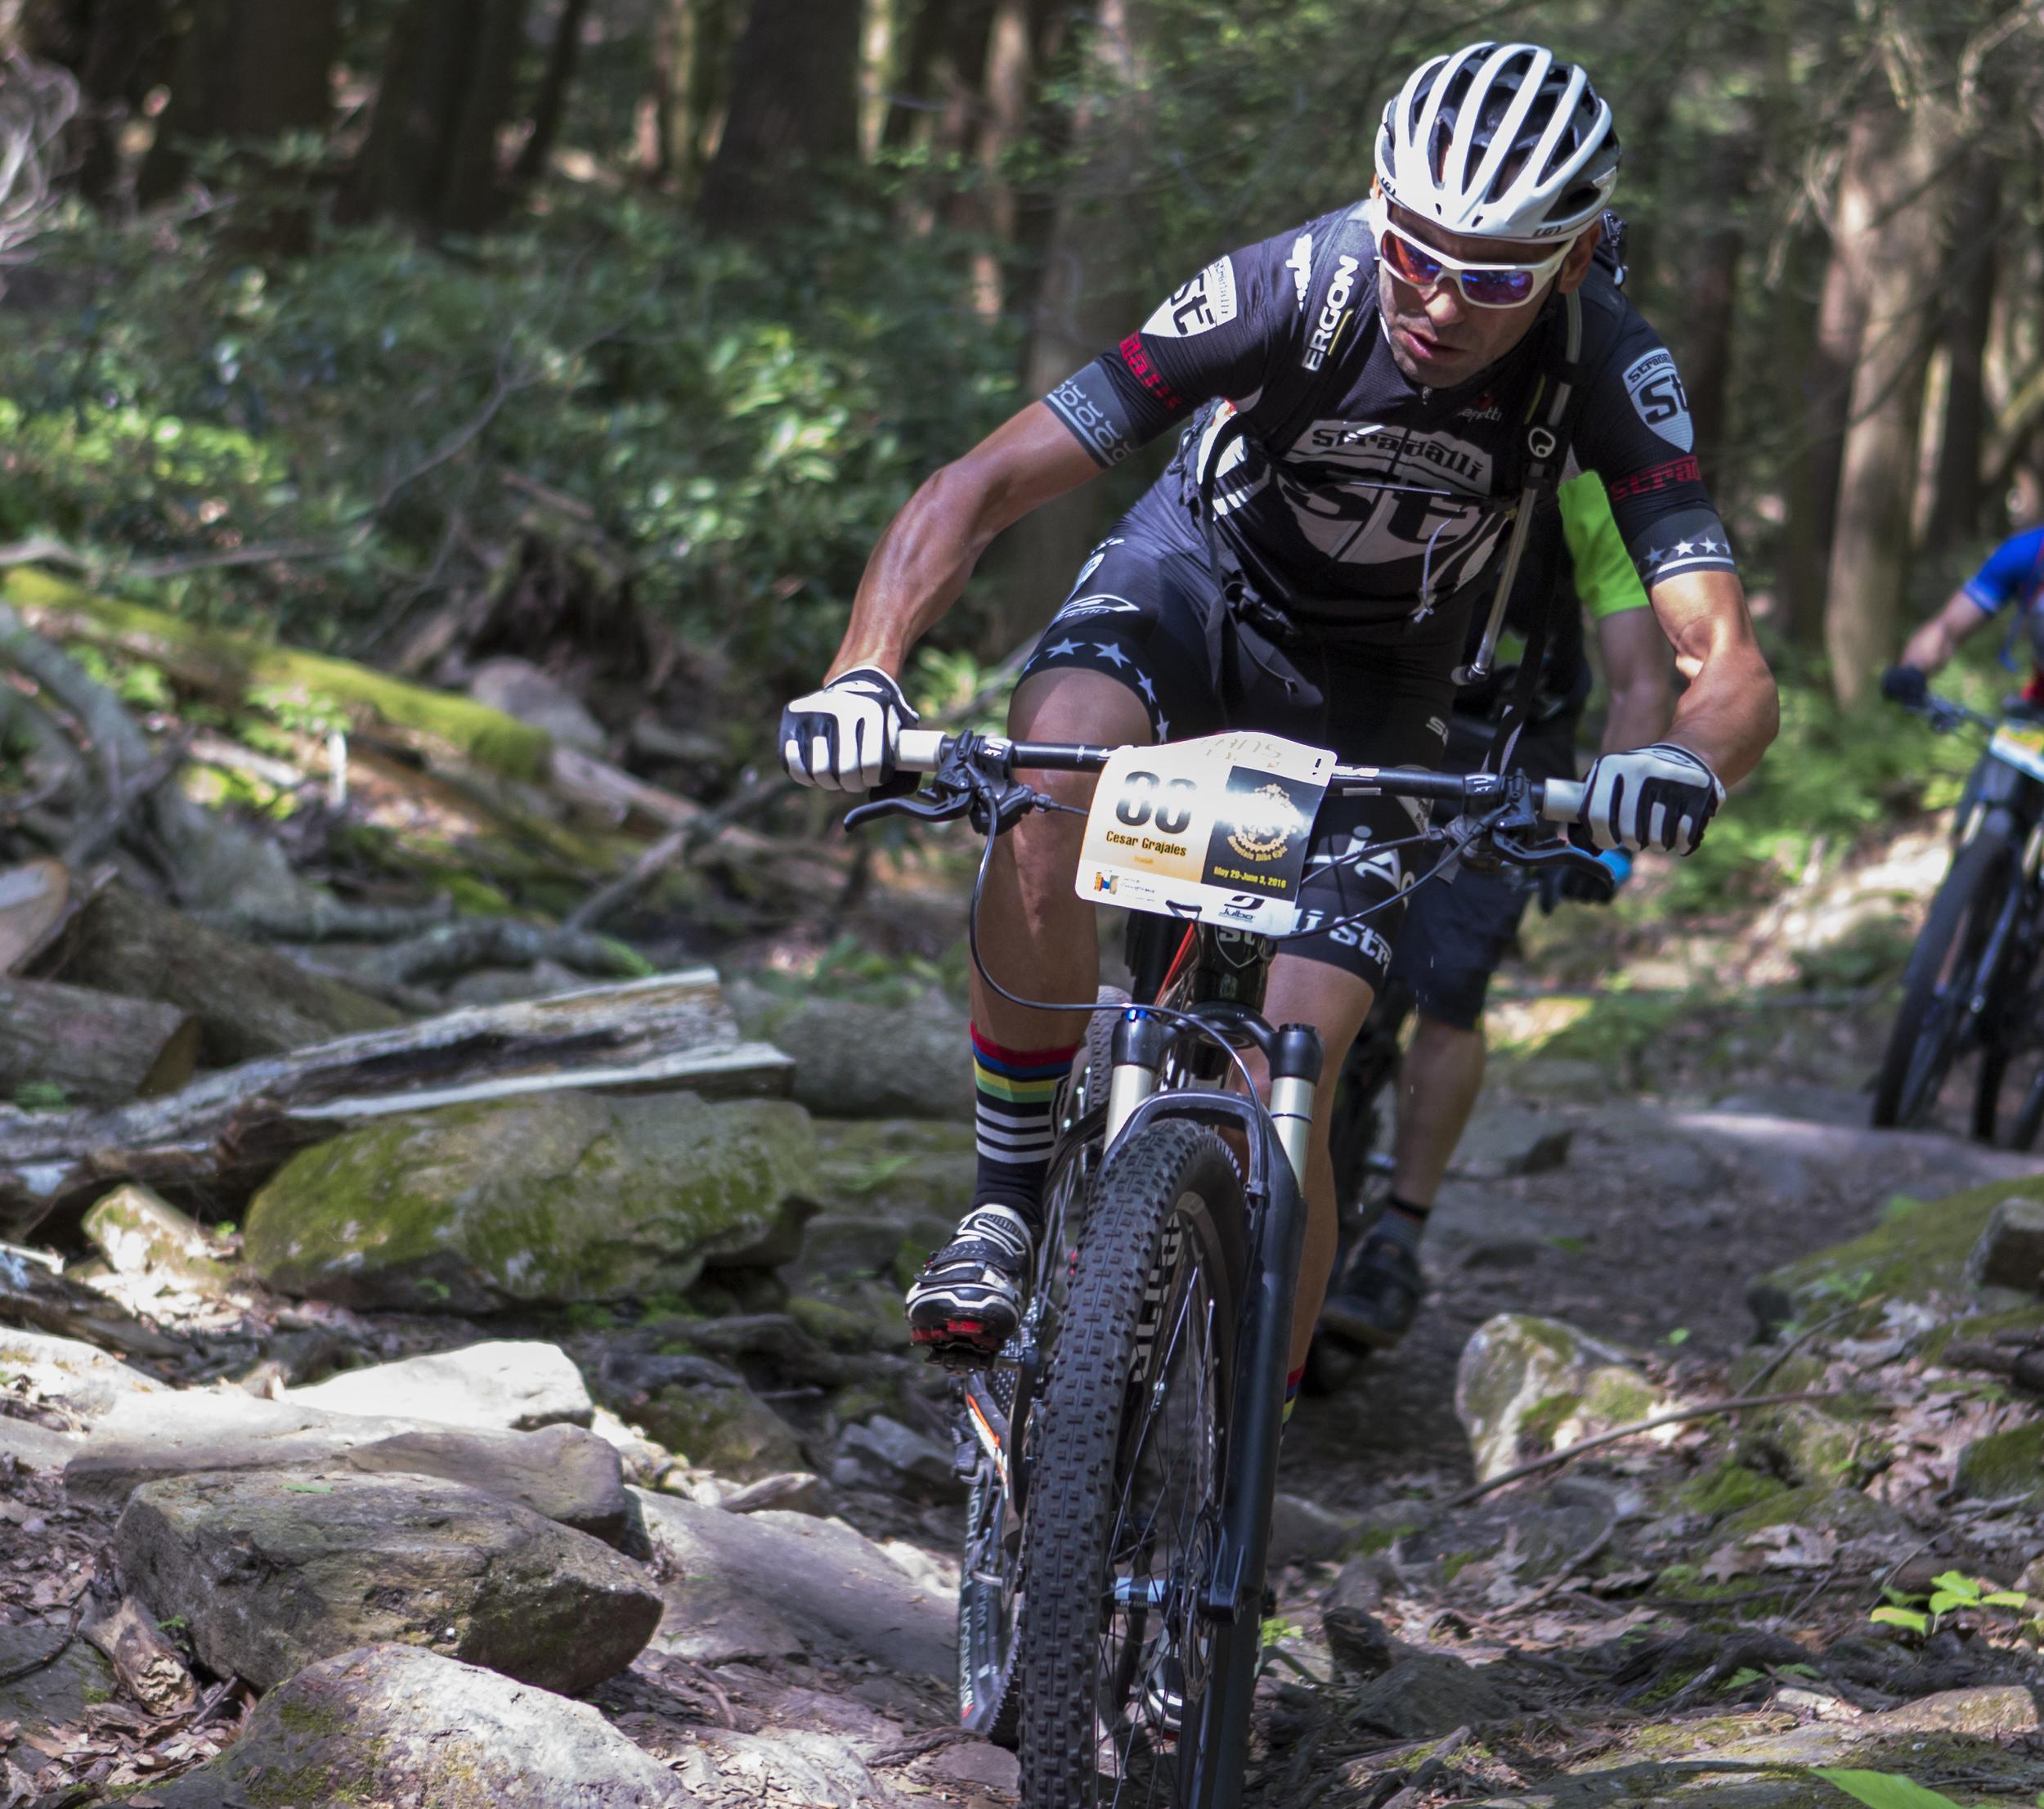 Stradalli team rider Cesar Grajales navigates the rocks in Shingletown Gap during the third stage of the Tran-Sylvania Epic Mountain Bike Ride on Wednesday, June 1, 2016.